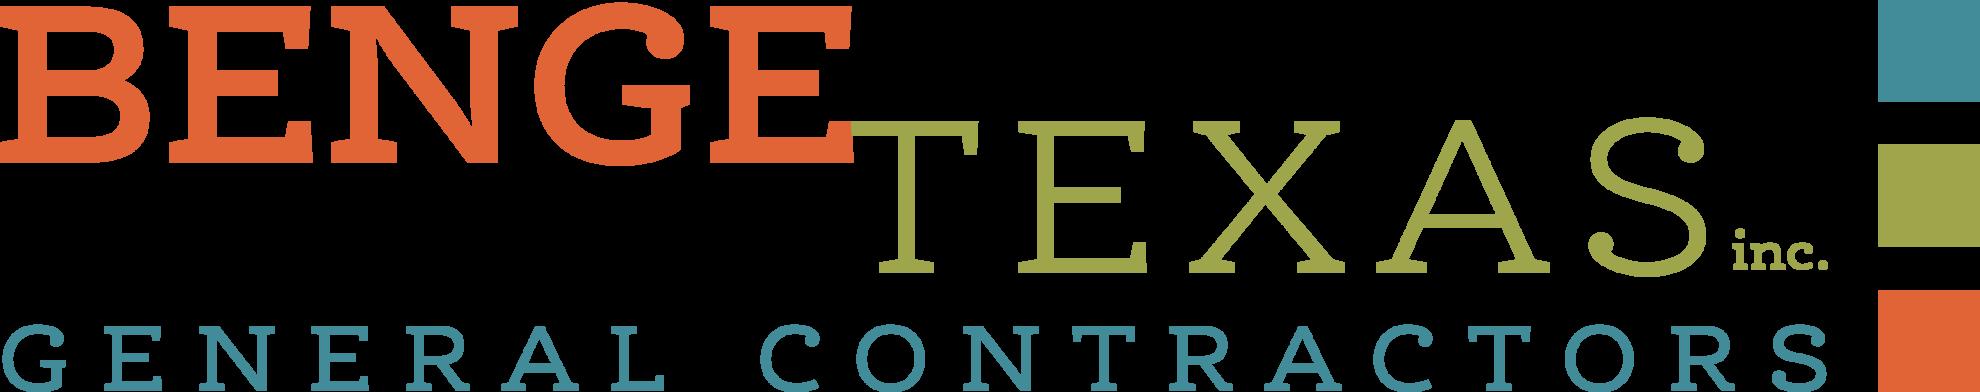 Benge Texas General Contractors Logo